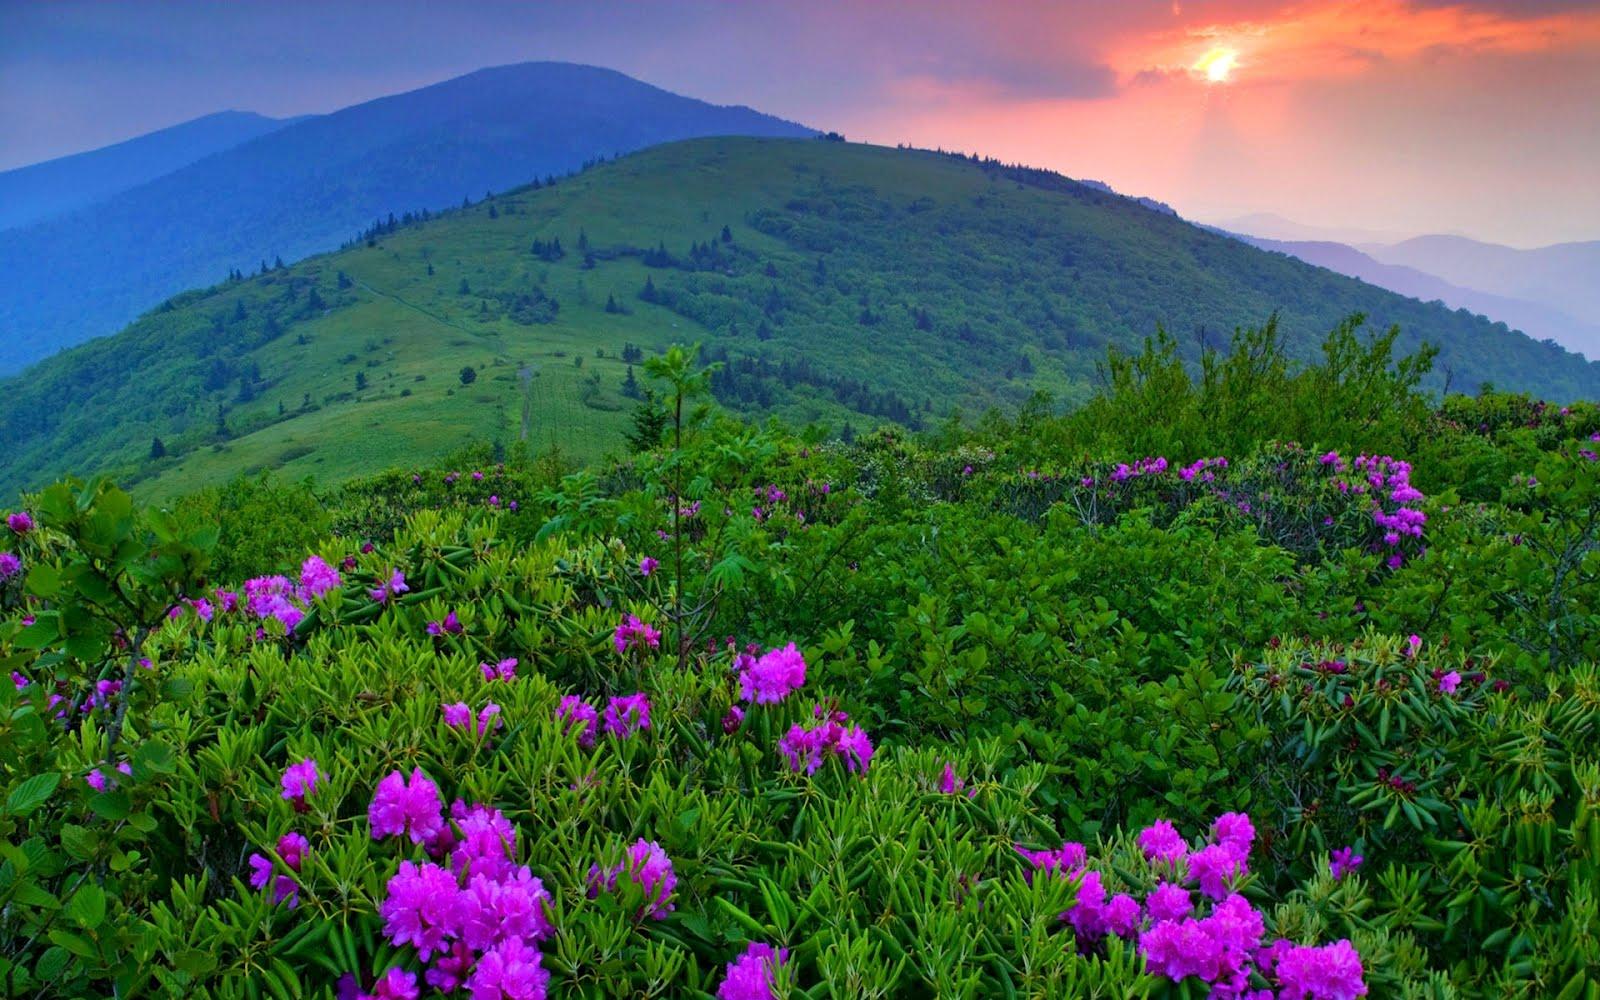 imagenes de paisajes naturales con animales - Imagenes De Paisajes Naturales Con Animales A Lapiz